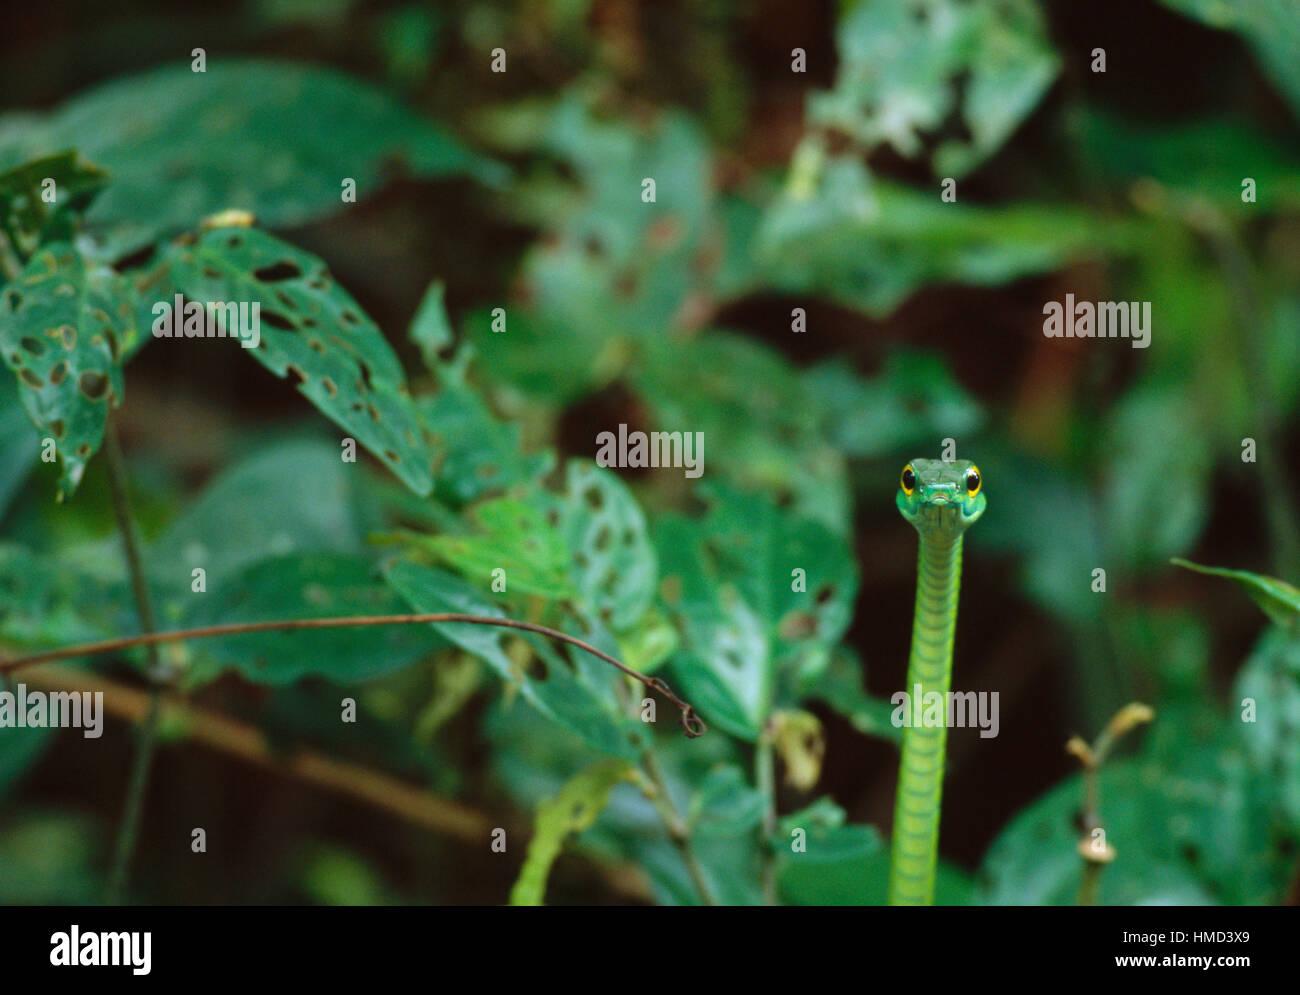 Kurznasige Rebe Schlange (Oxybelis Brevirostris), Cahuita Nationalpark, Karibikküste Costa Rica Stockfoto